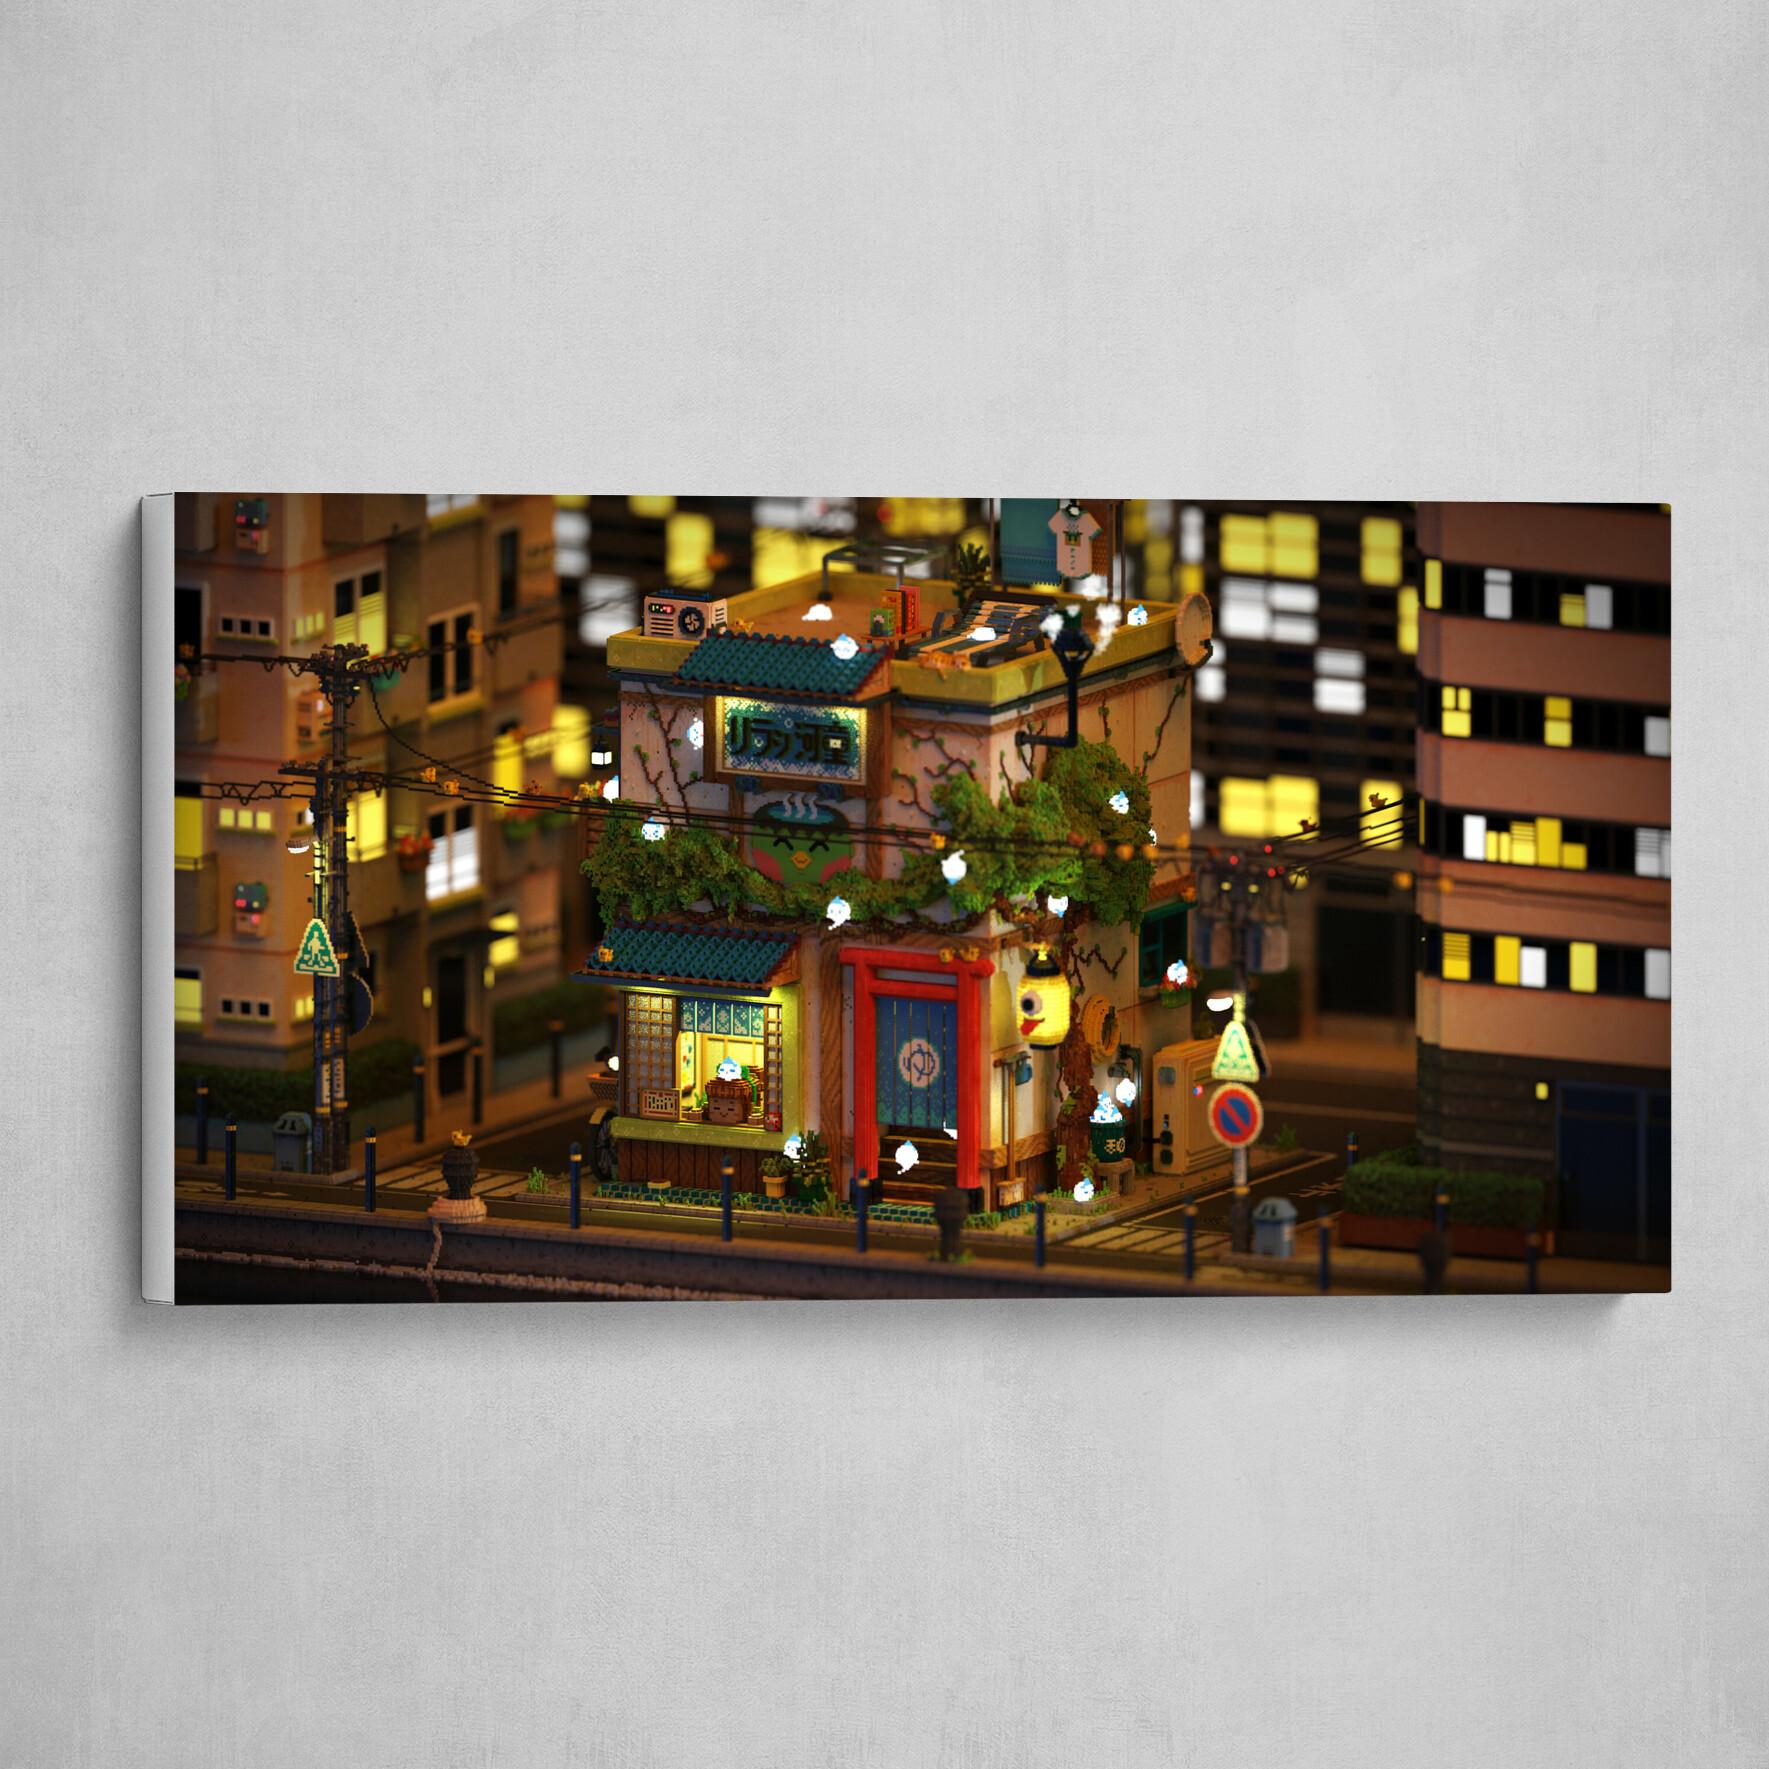 Voxel - Onsen Street - Night 04